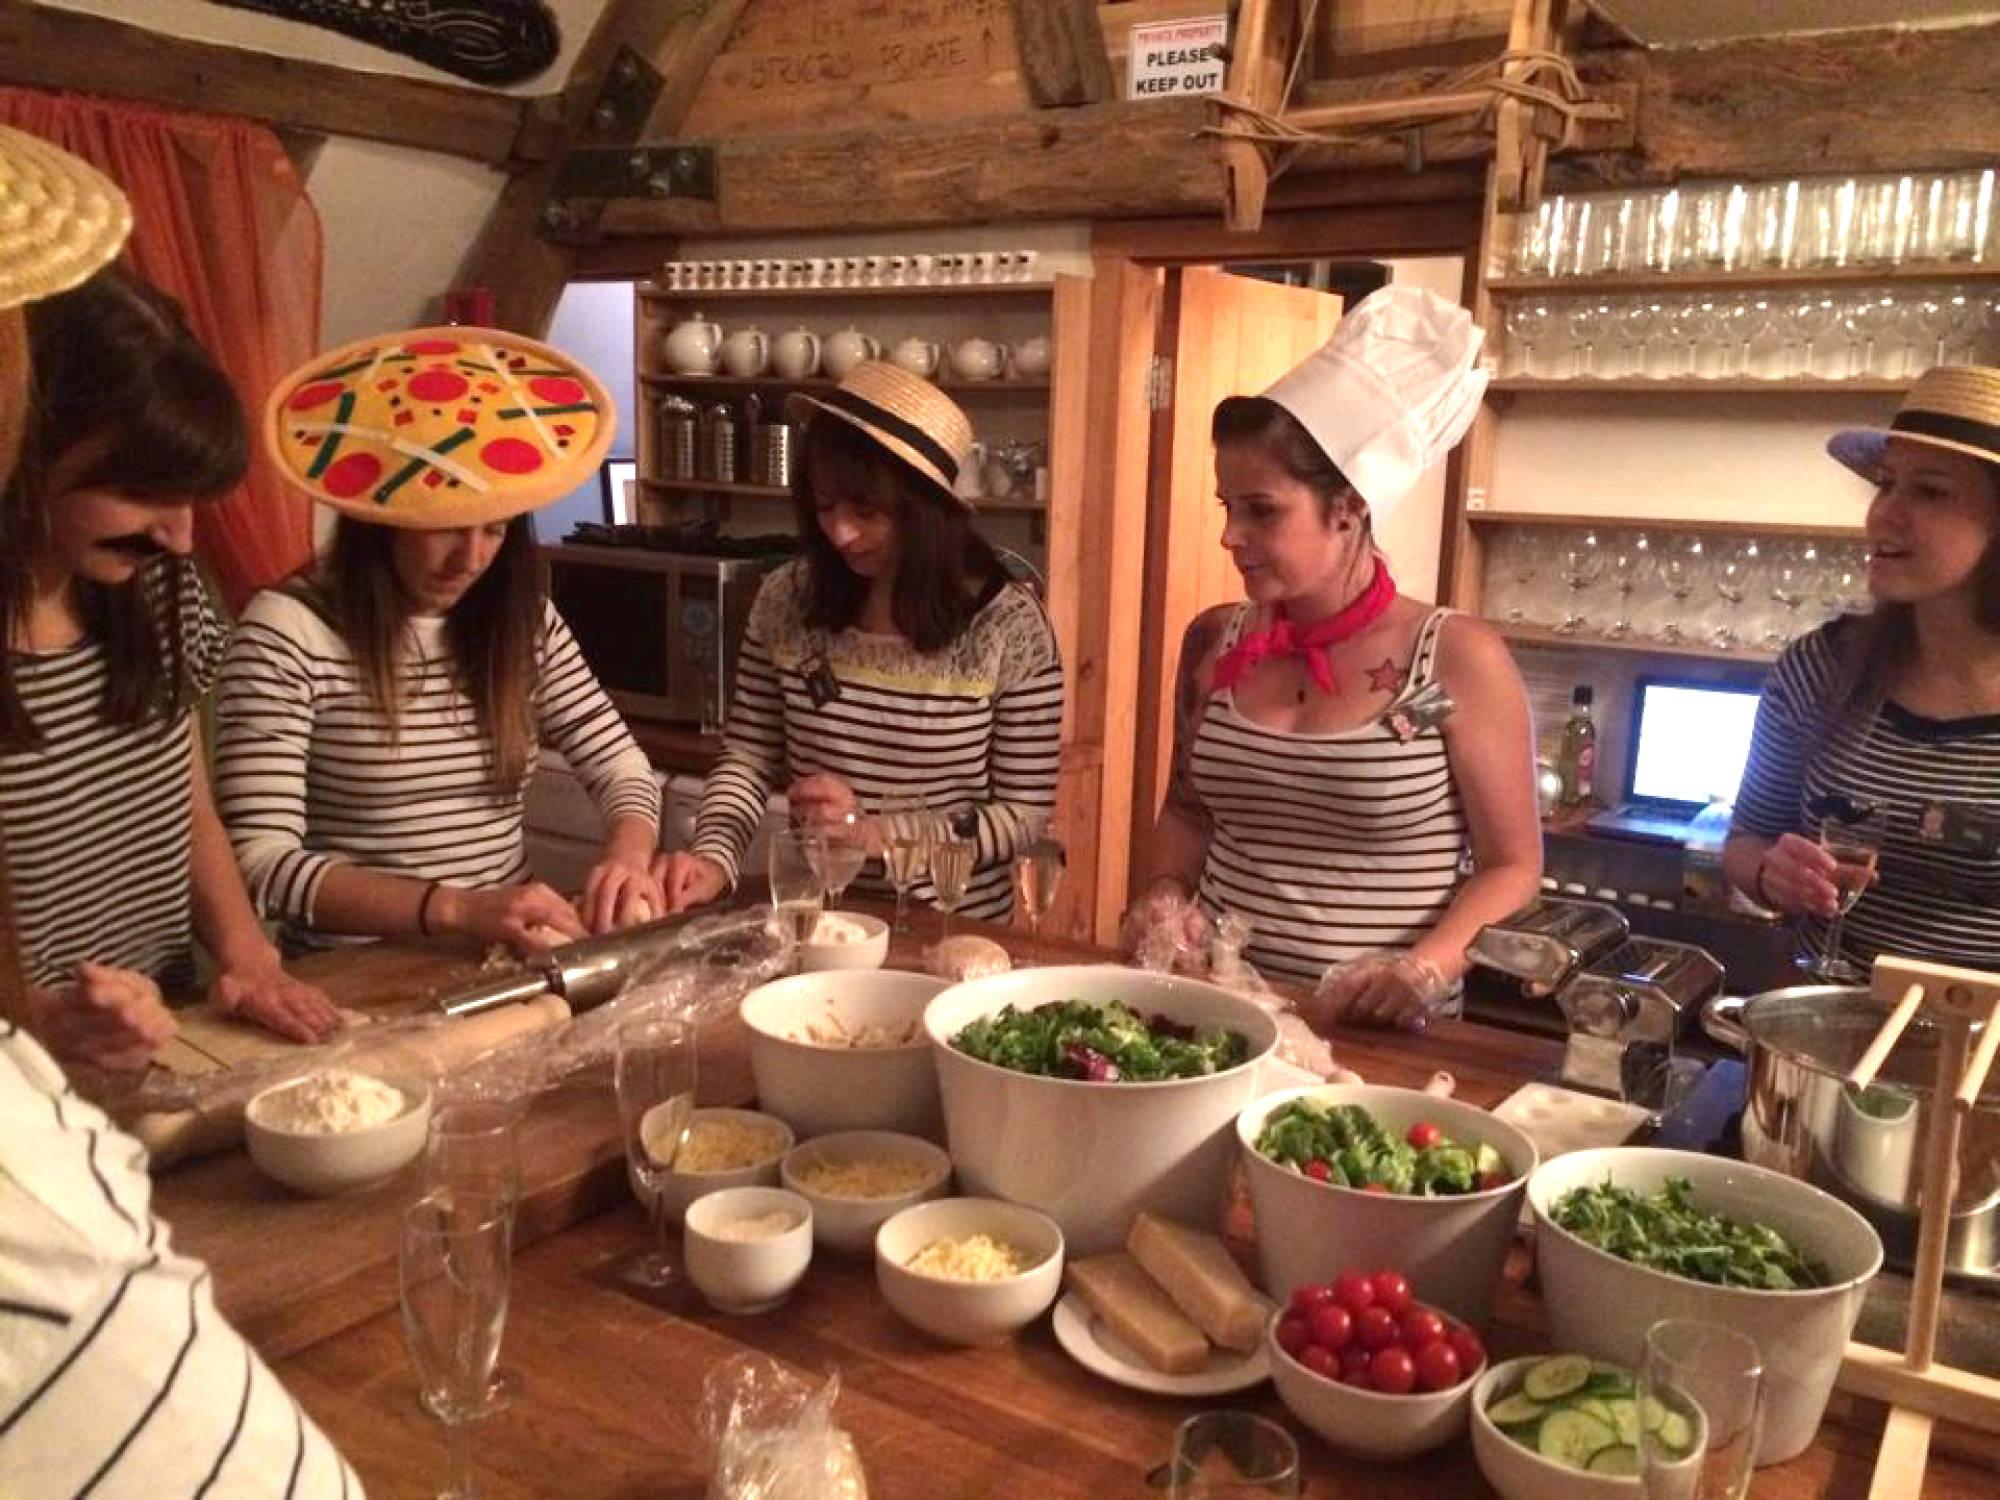 hen-pasta-making-4.jpg